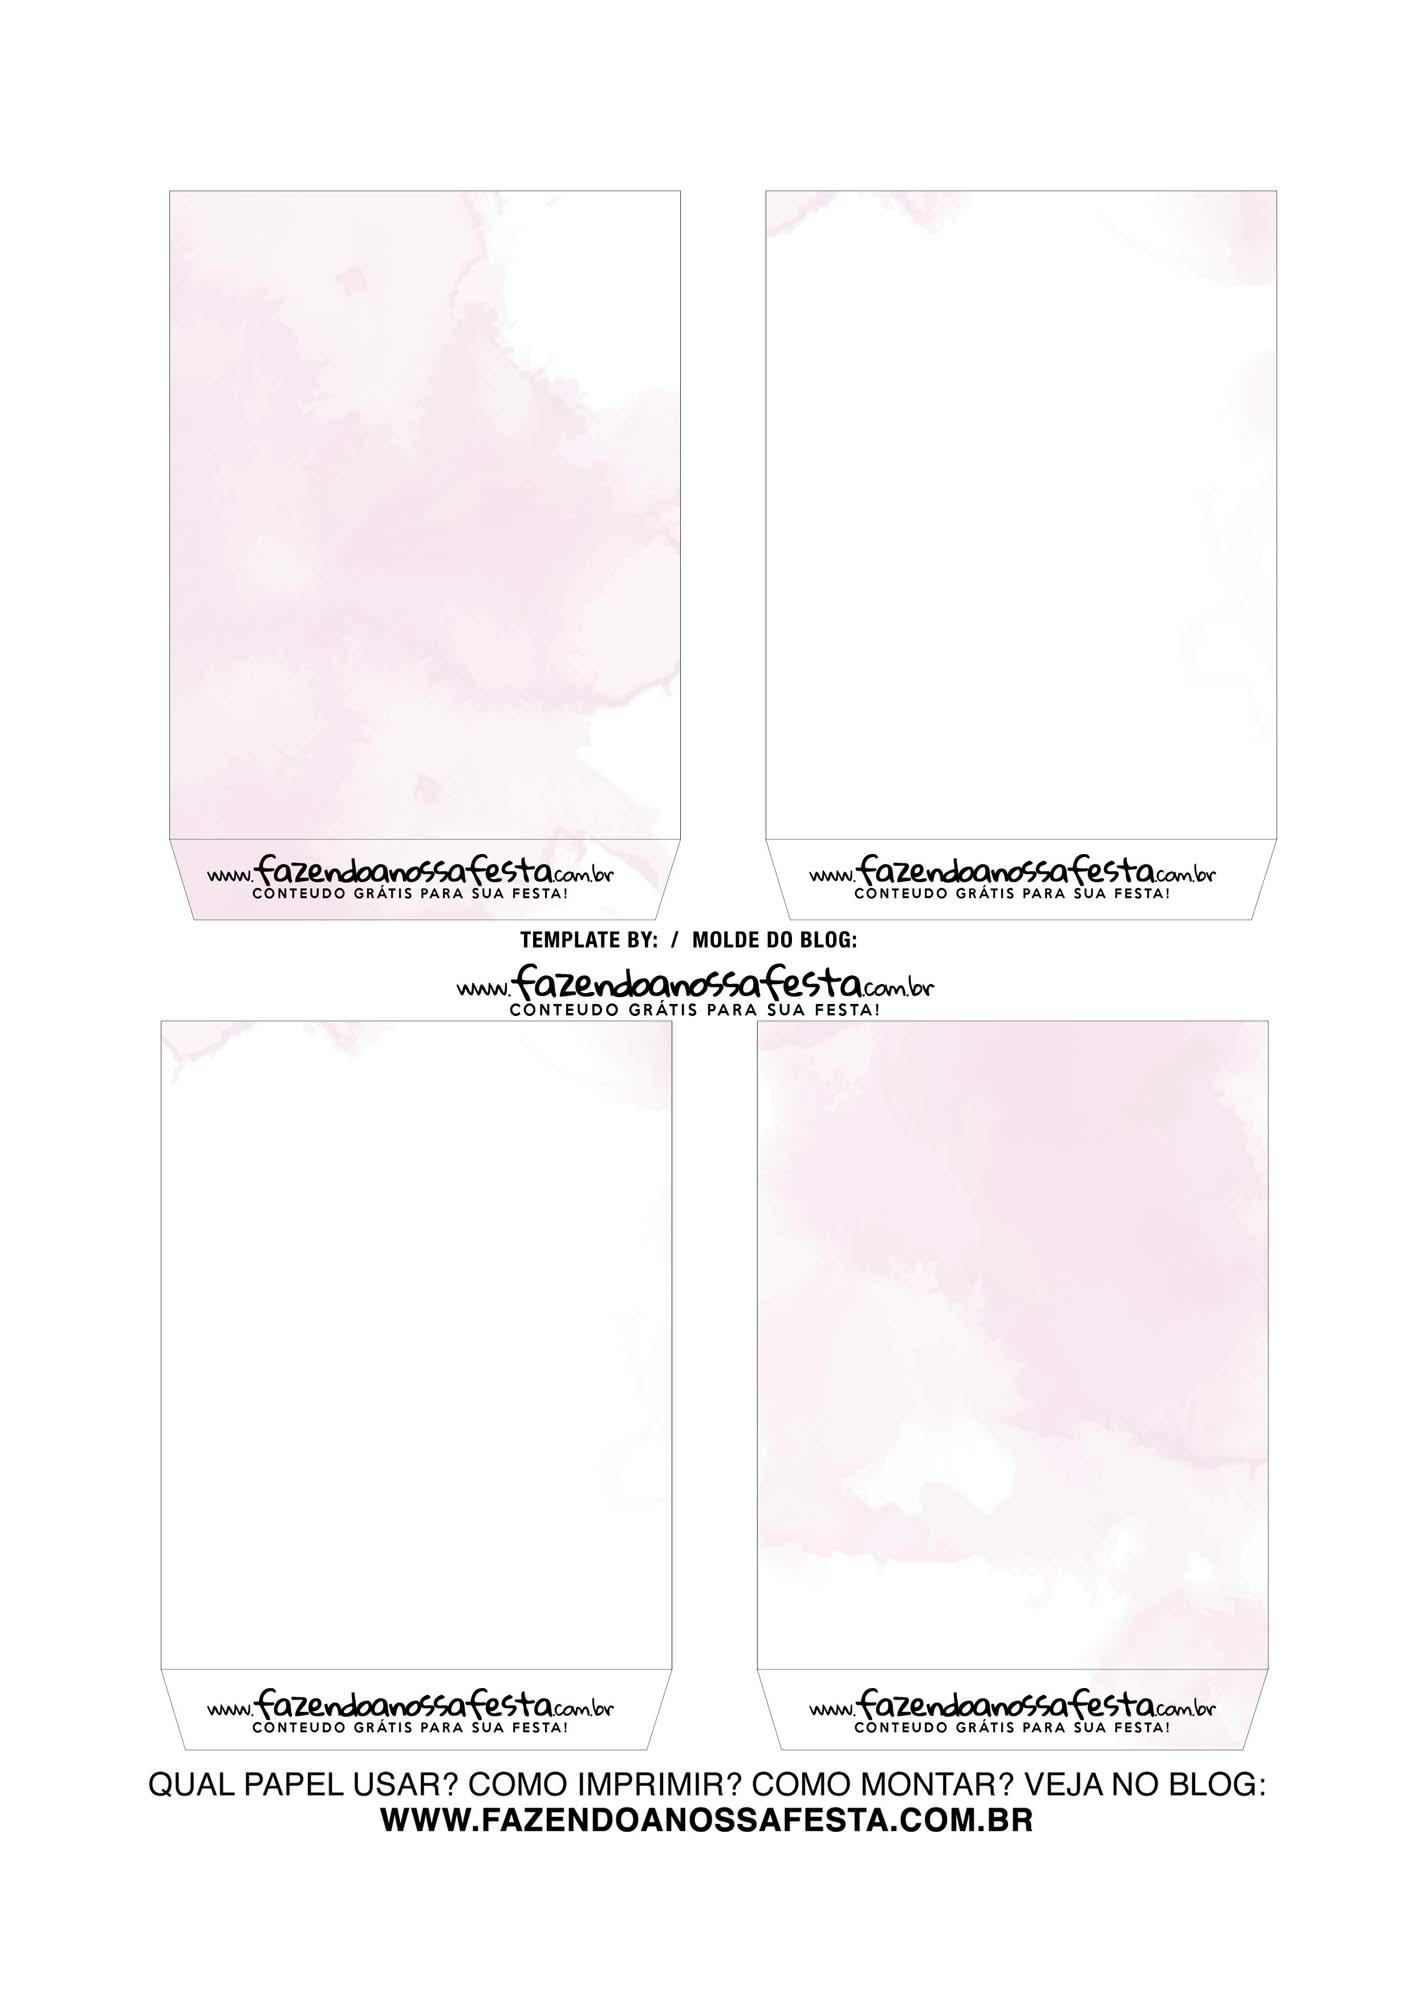 Caixa Explosiva Dia das Maes Floral Rosa Aquarela 4